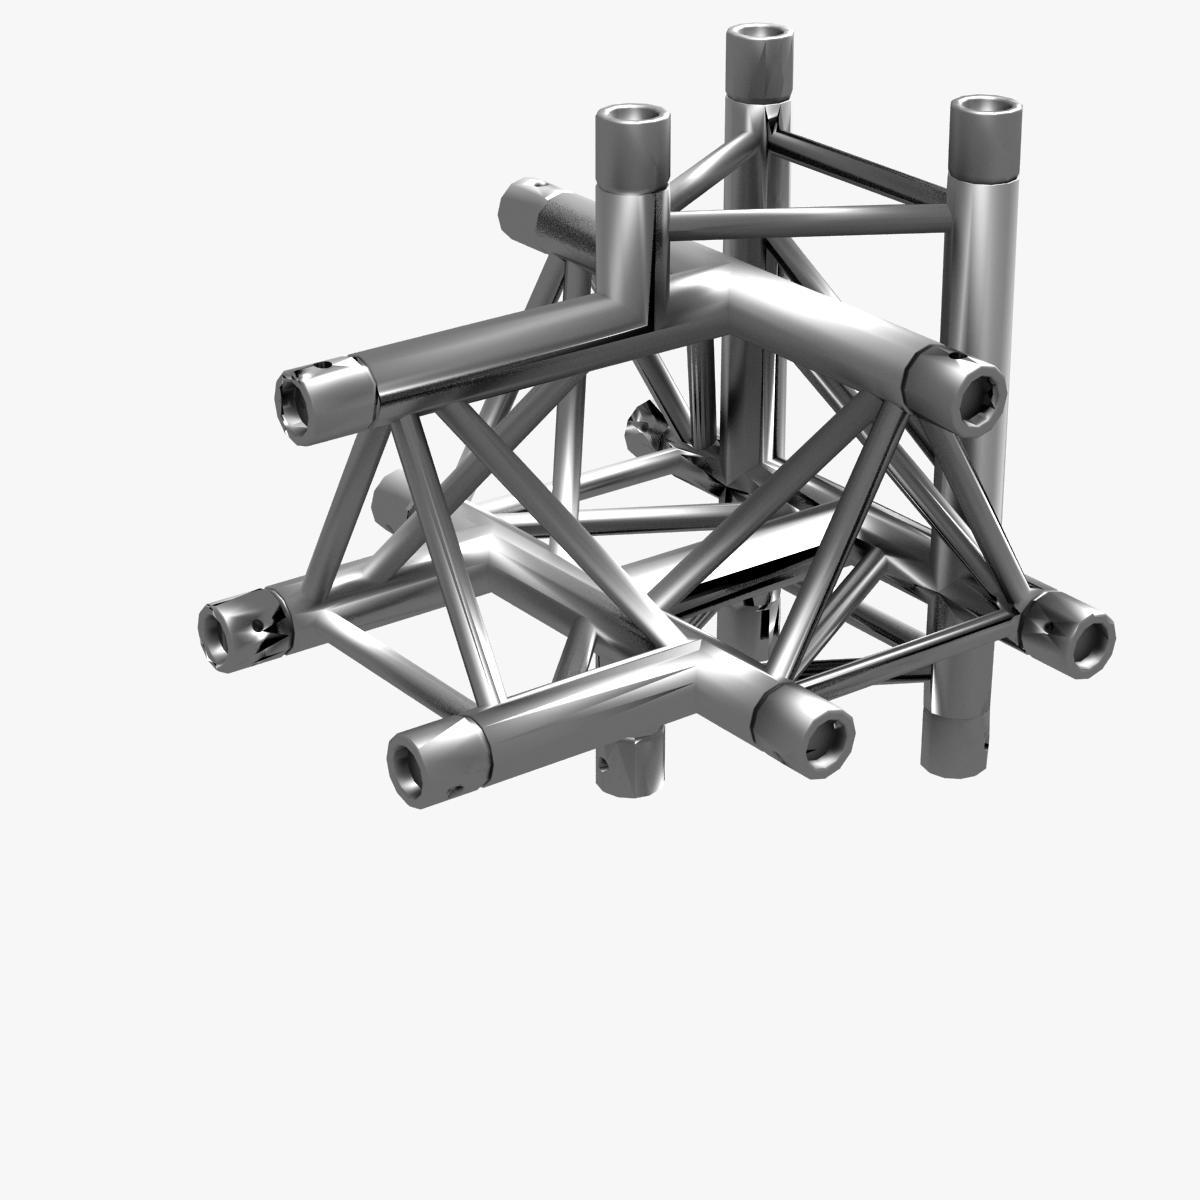 triangular trusses (collection 55 modular pieces) 3d model 3ds max dxf fbx c4d dae texture obj 216227